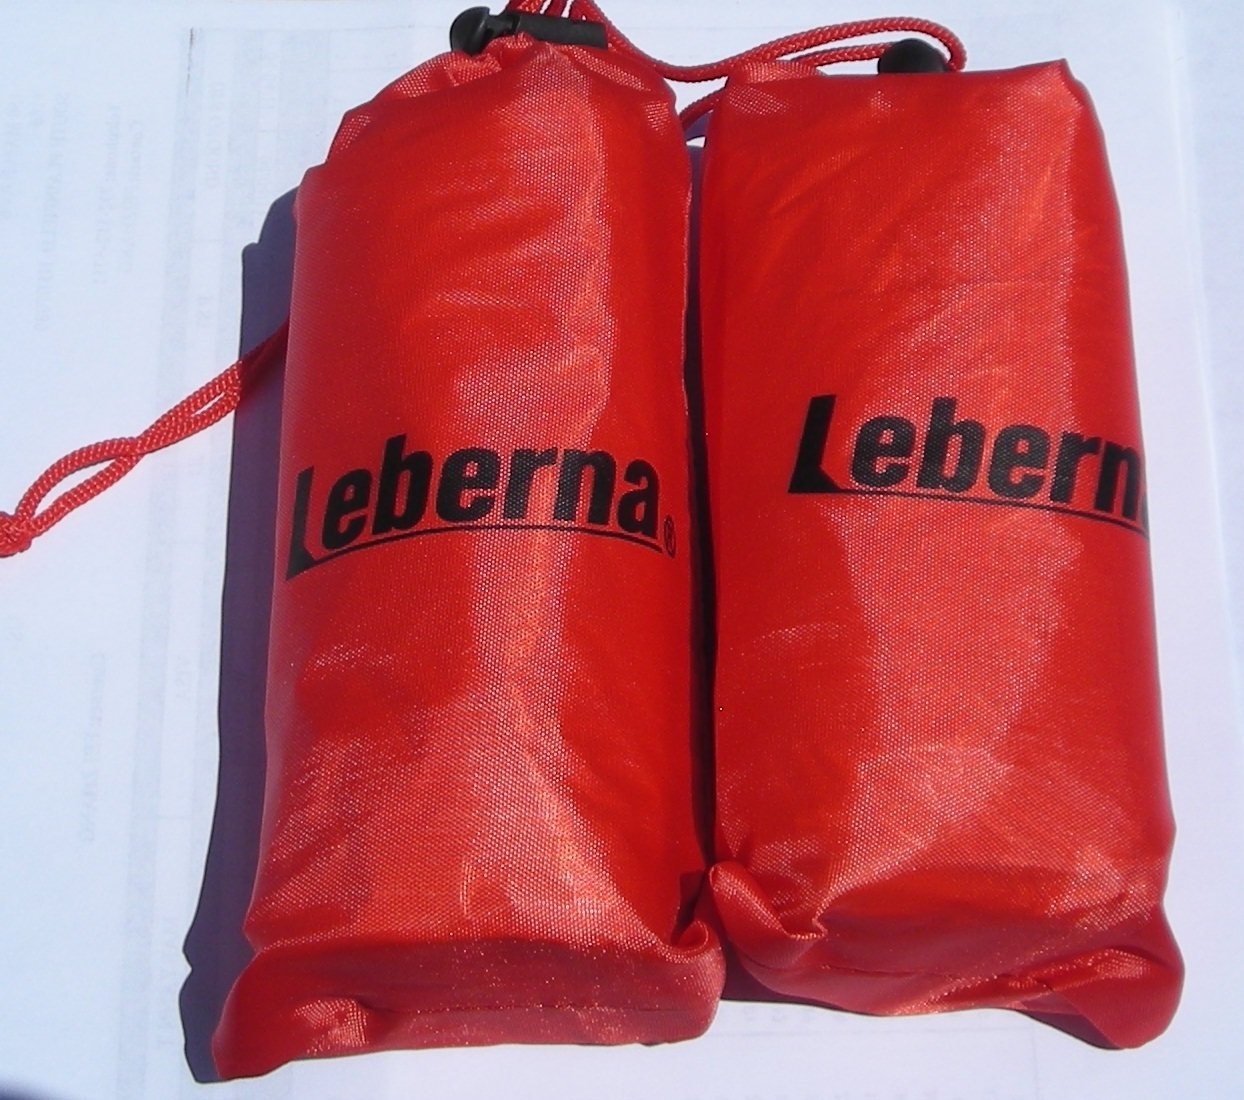 Emergency Survival Mylar Thermal Sleeping Bag - 3 FT x 7 FT 36''x84'', 2 Sleeping Bags in One Box, Each Sleeping Bag in One Carry Bag